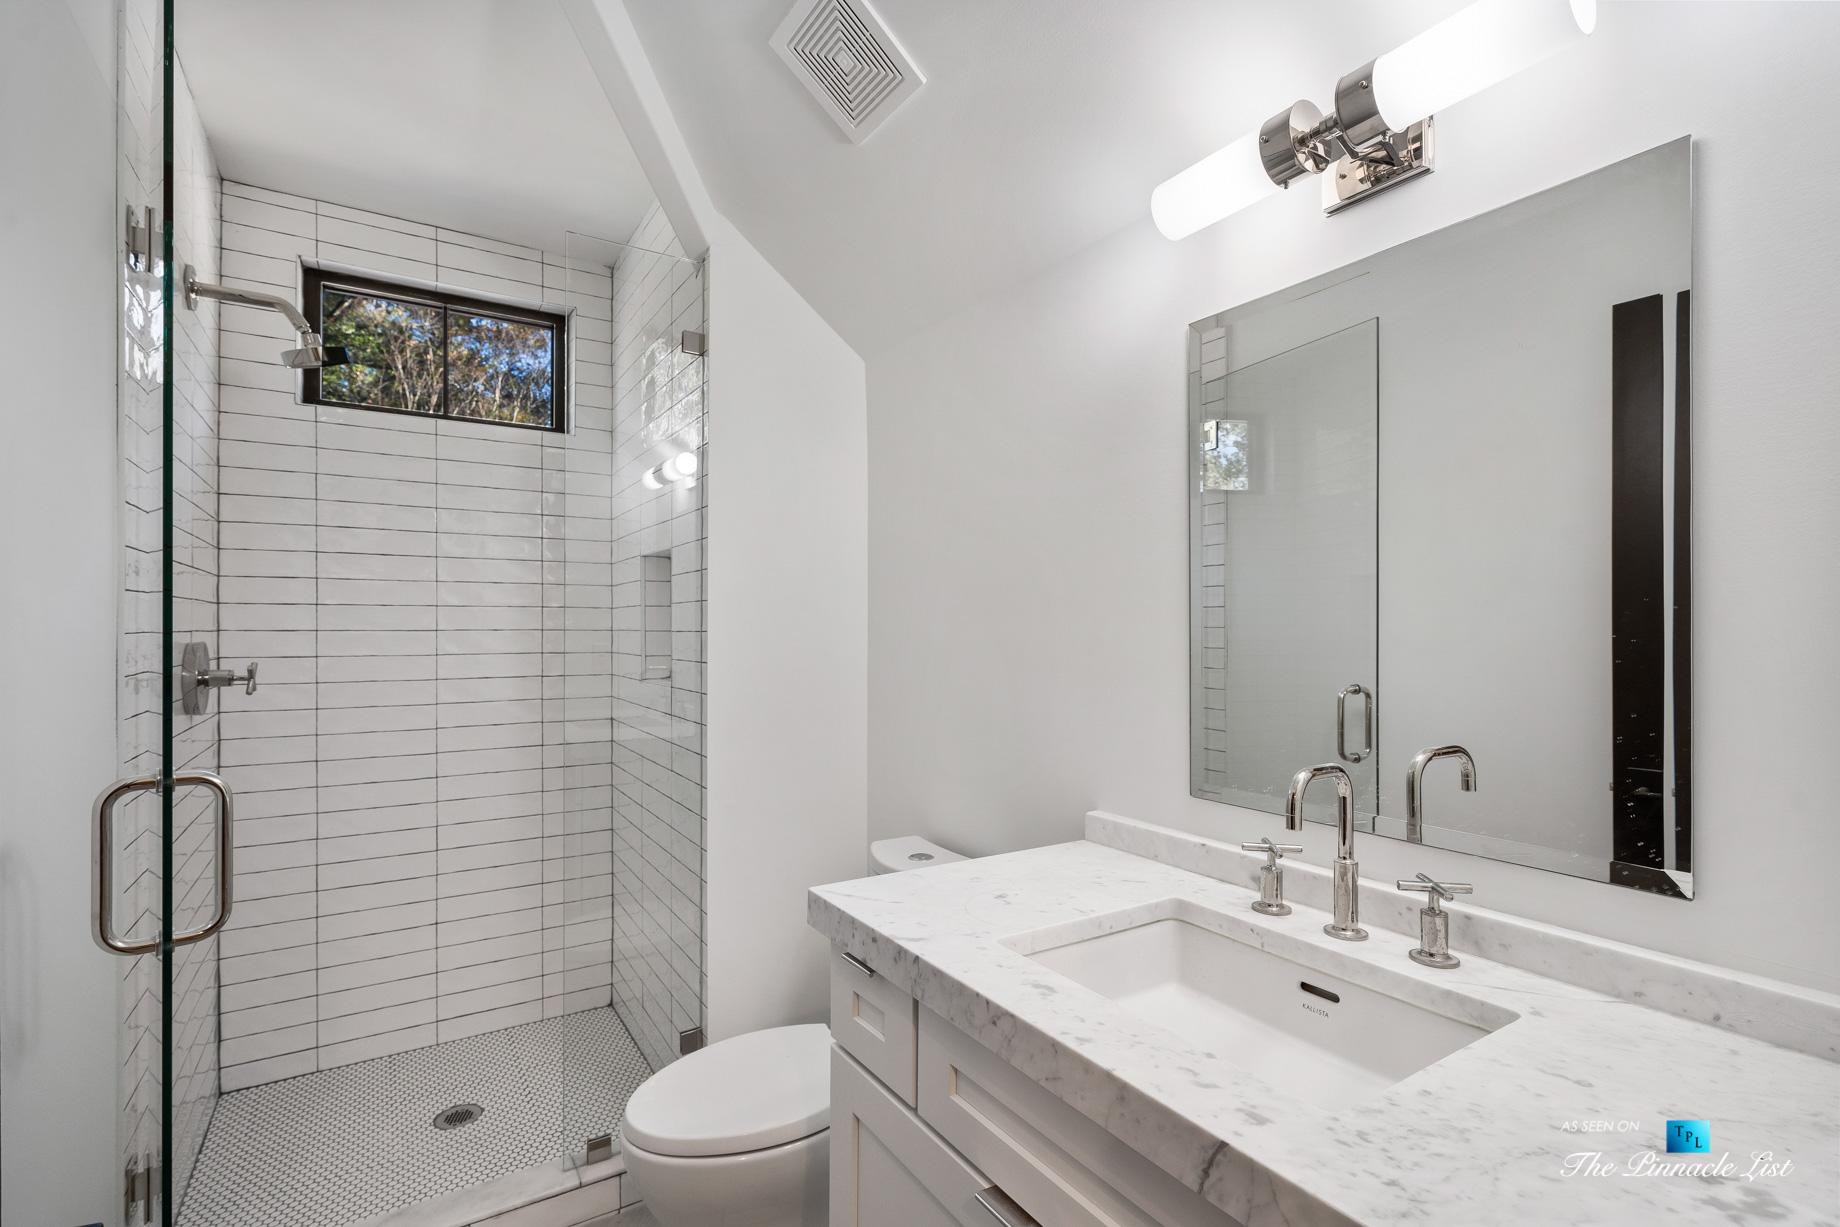 447 Valley Rd NW, Atlanta, GA, USA - Washroom and Shower - Luxury Real Estate - Tuxedo Park Home